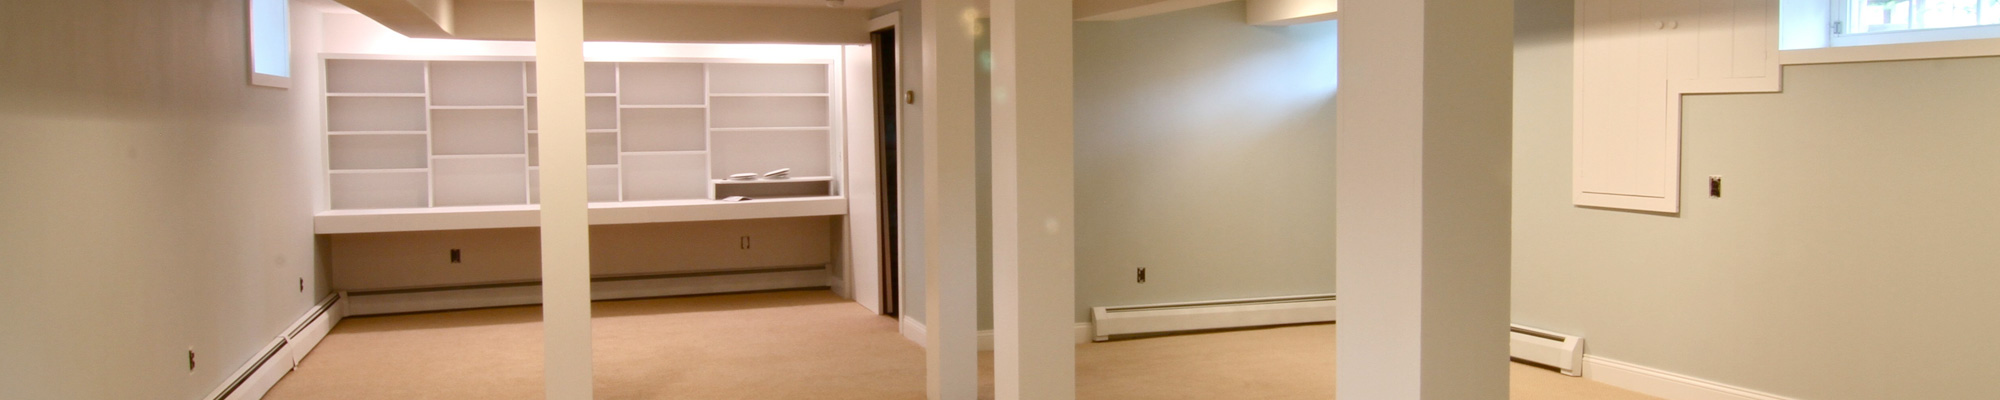 basement lowering underpinning and basement renovations